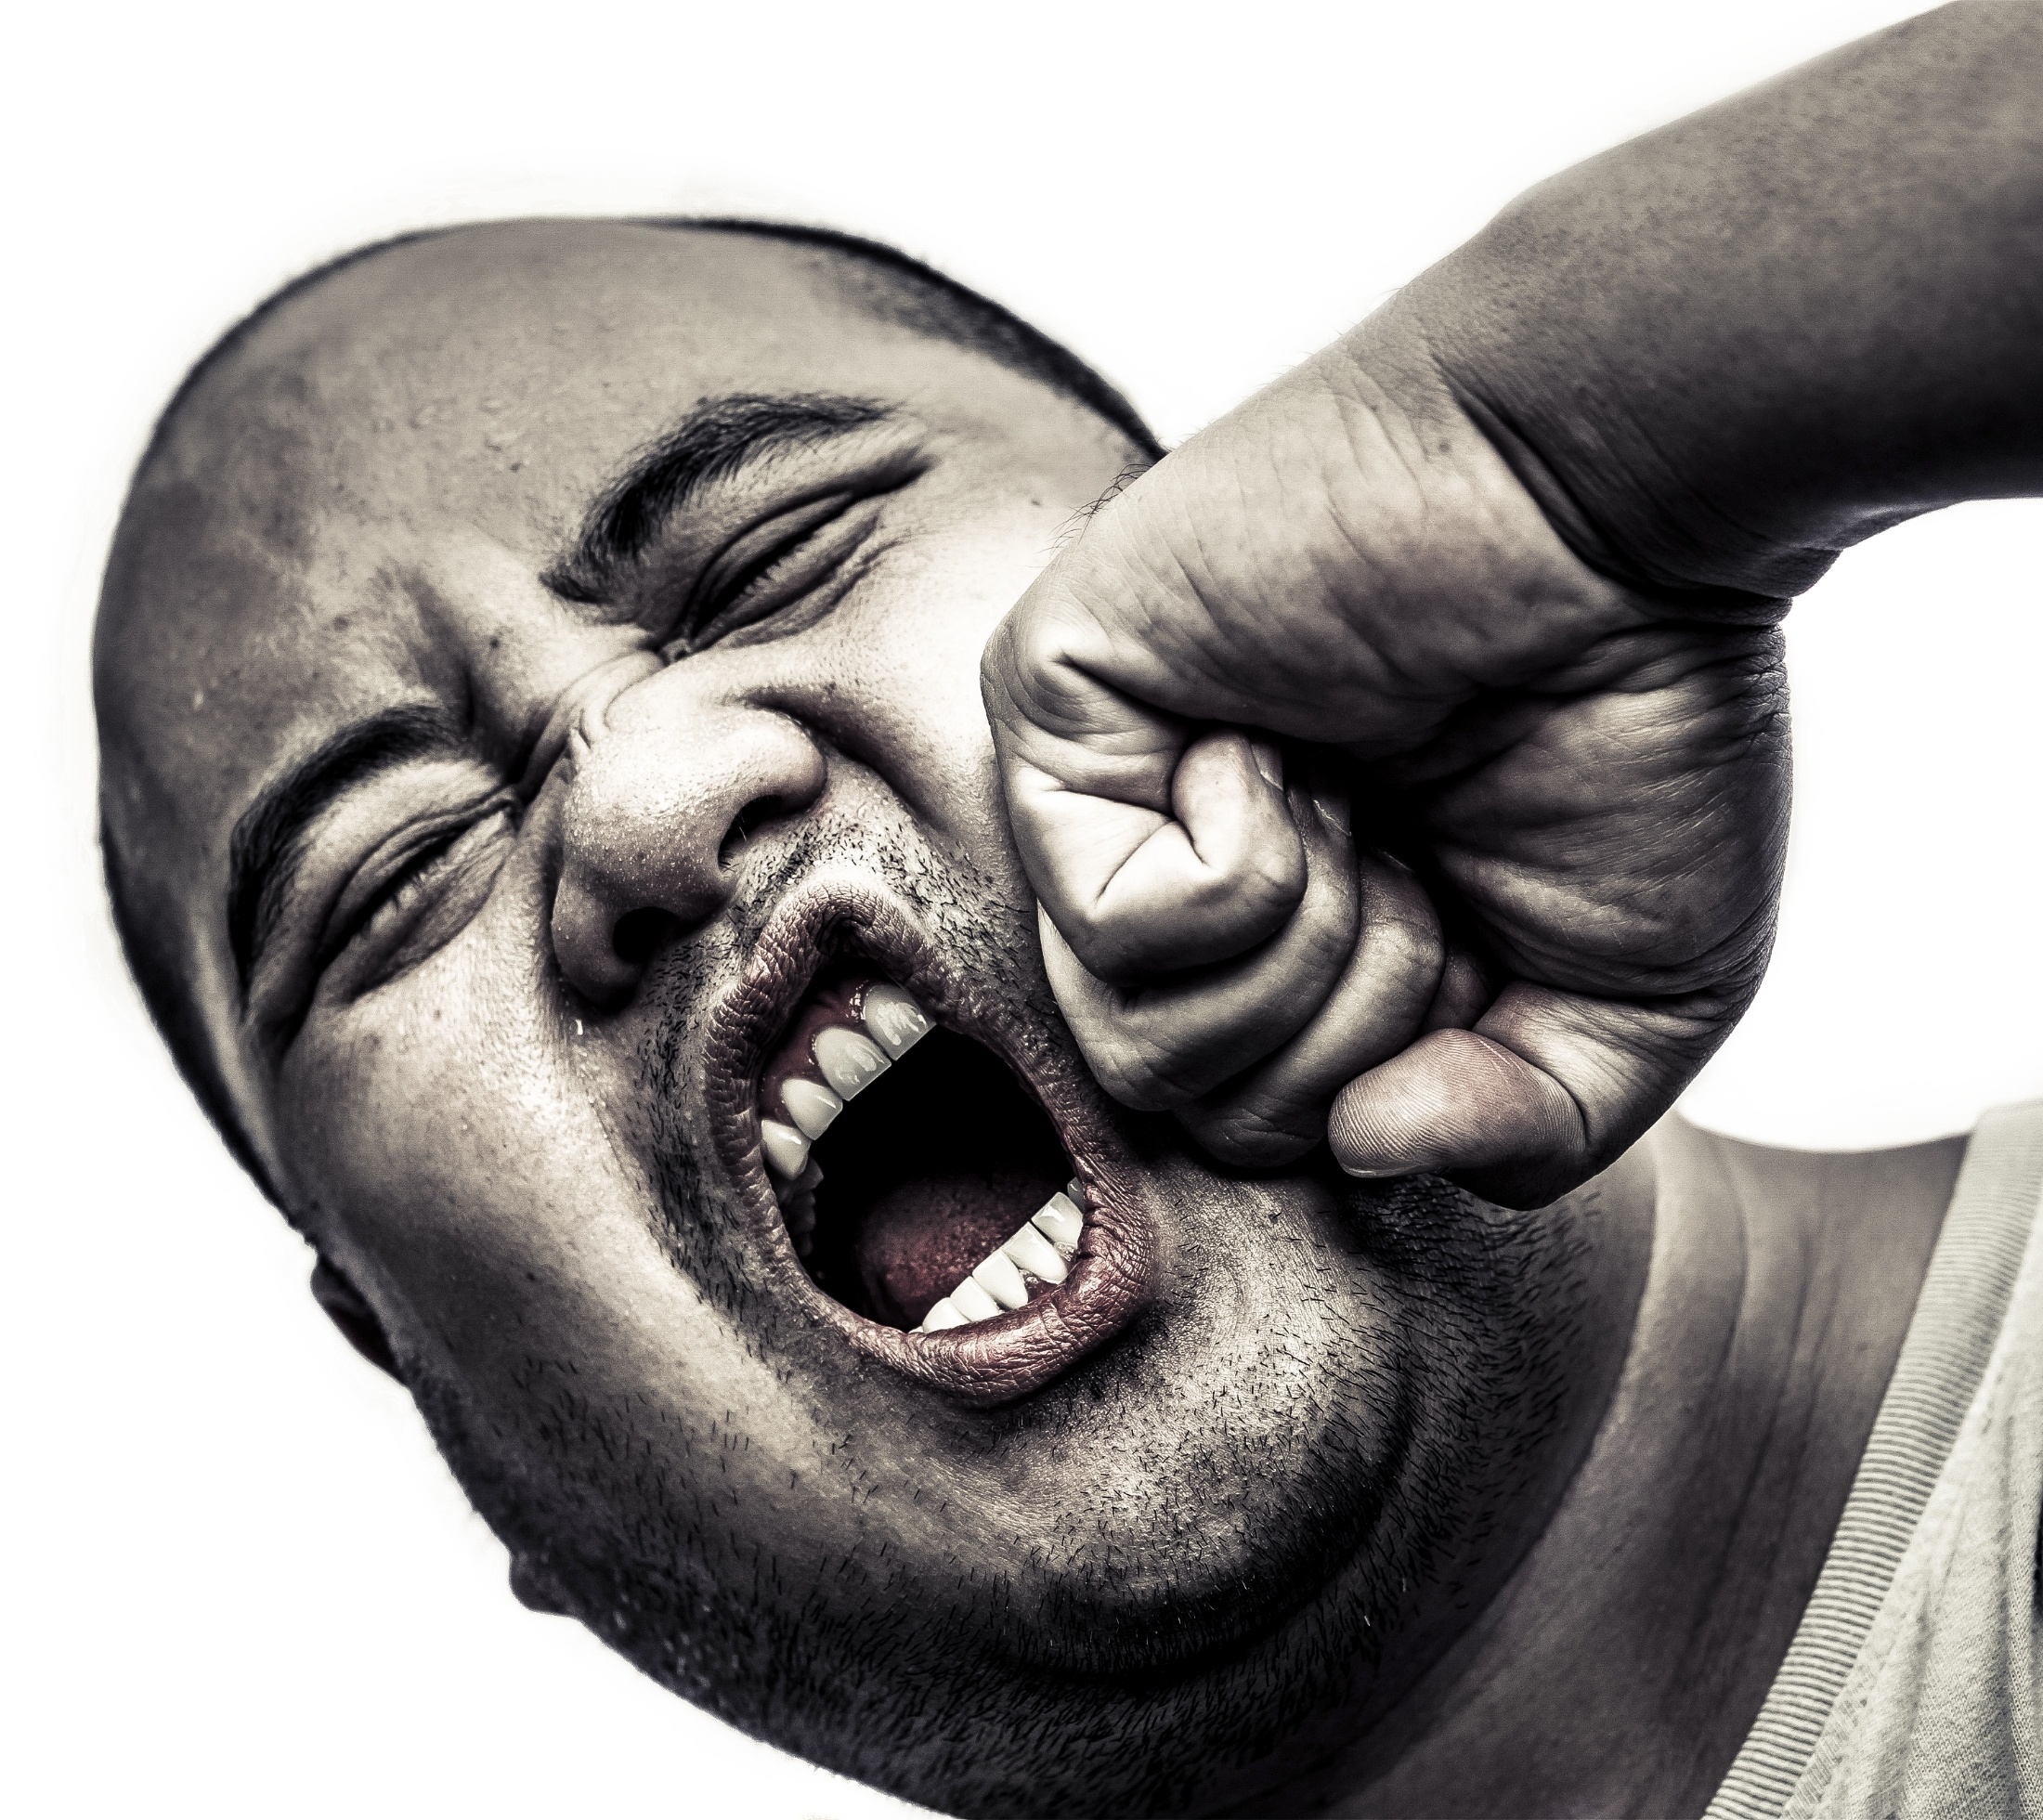 bigstock-I-bald-head-man-got-punch-in-t-83463392-343850-edited